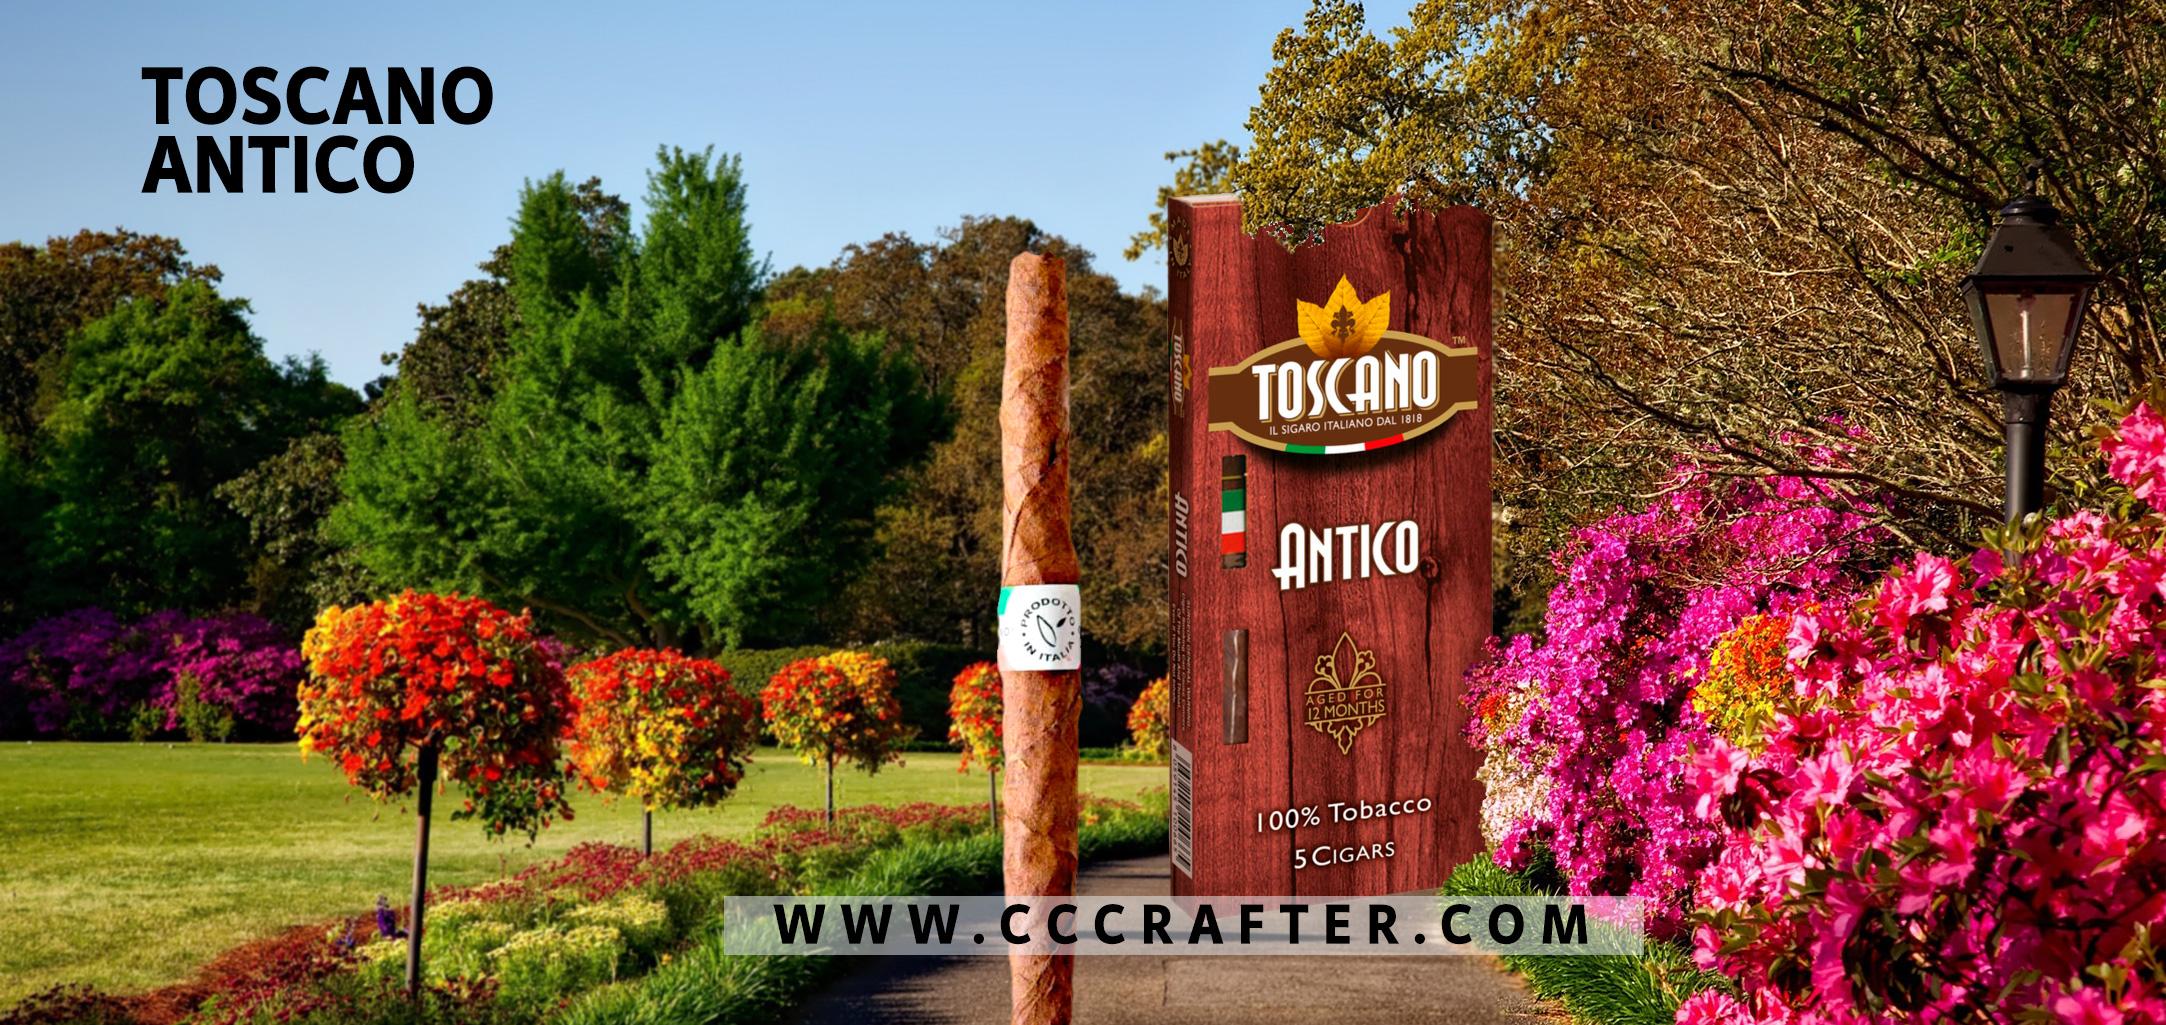 toscano-antico-banner.jpg